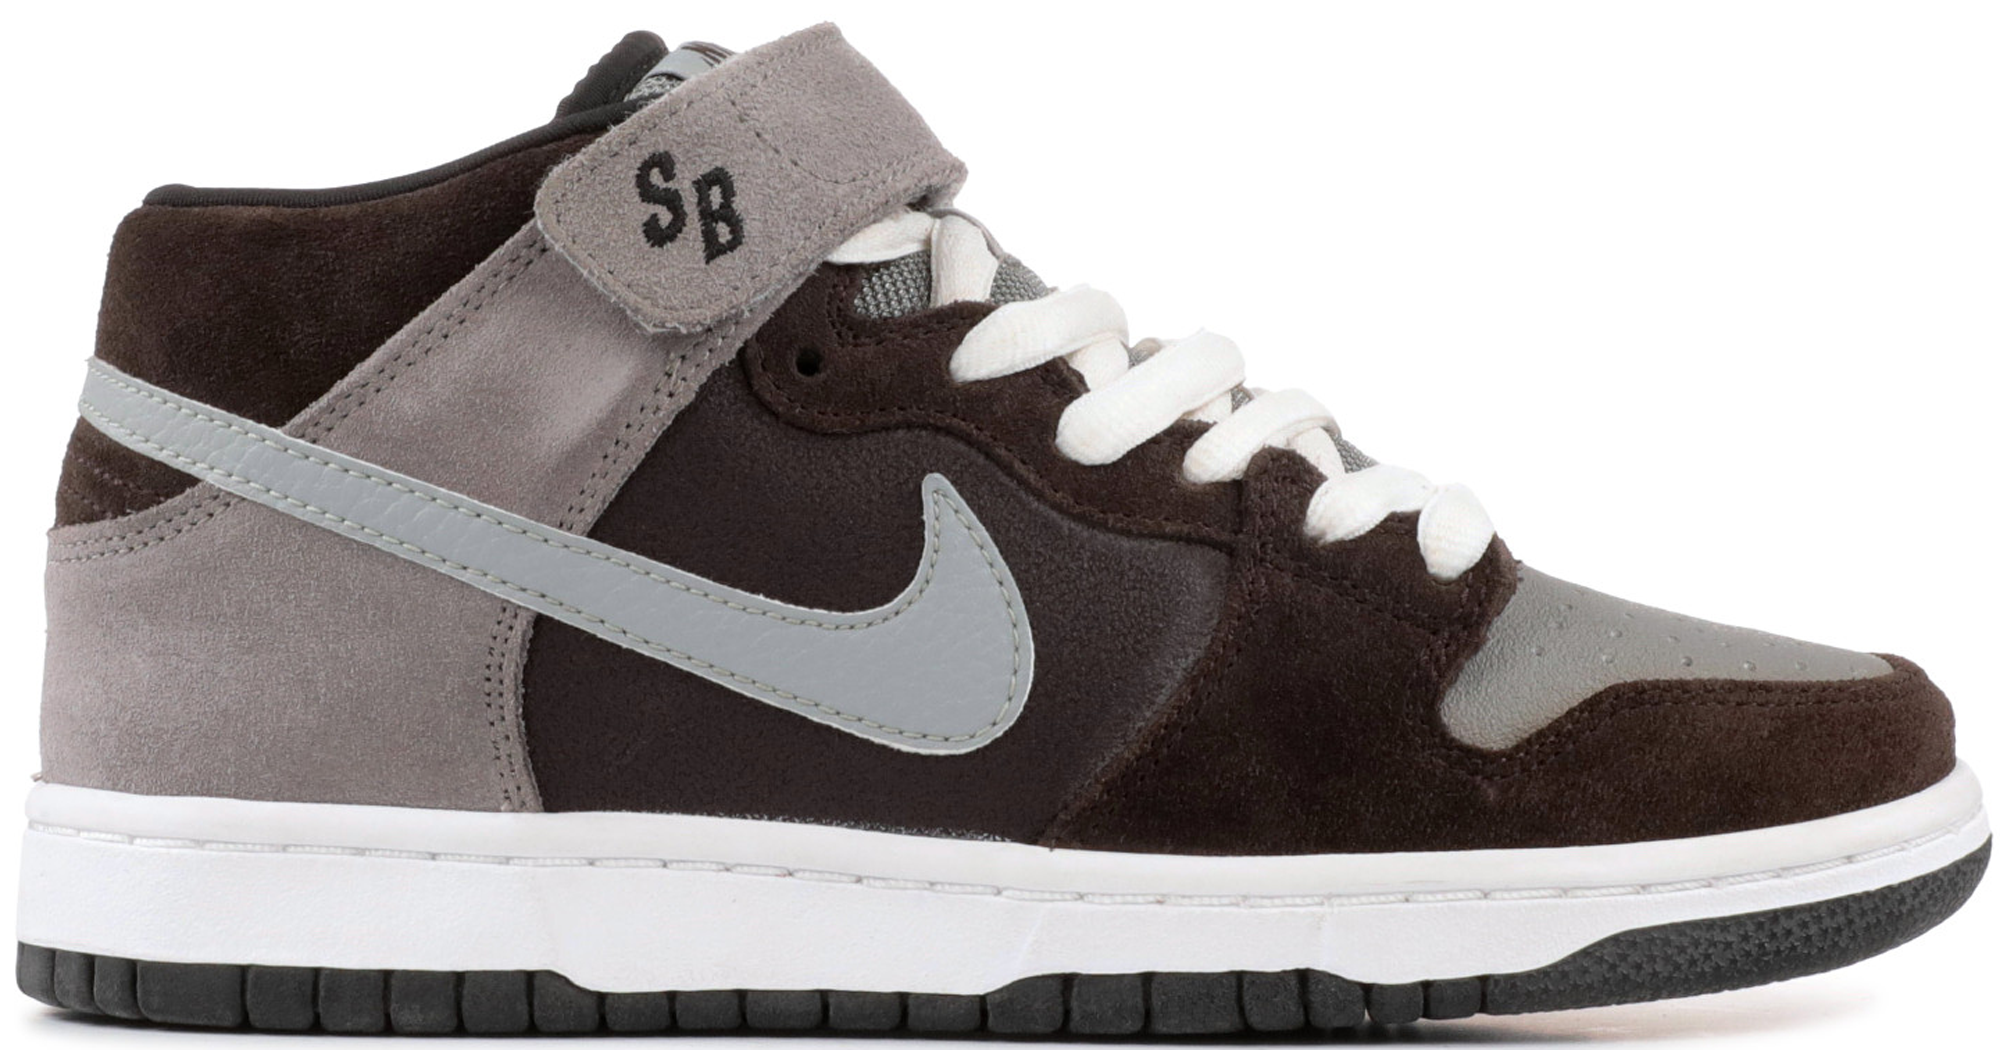 Nike SB Dunk Mid Cappuccino Silver